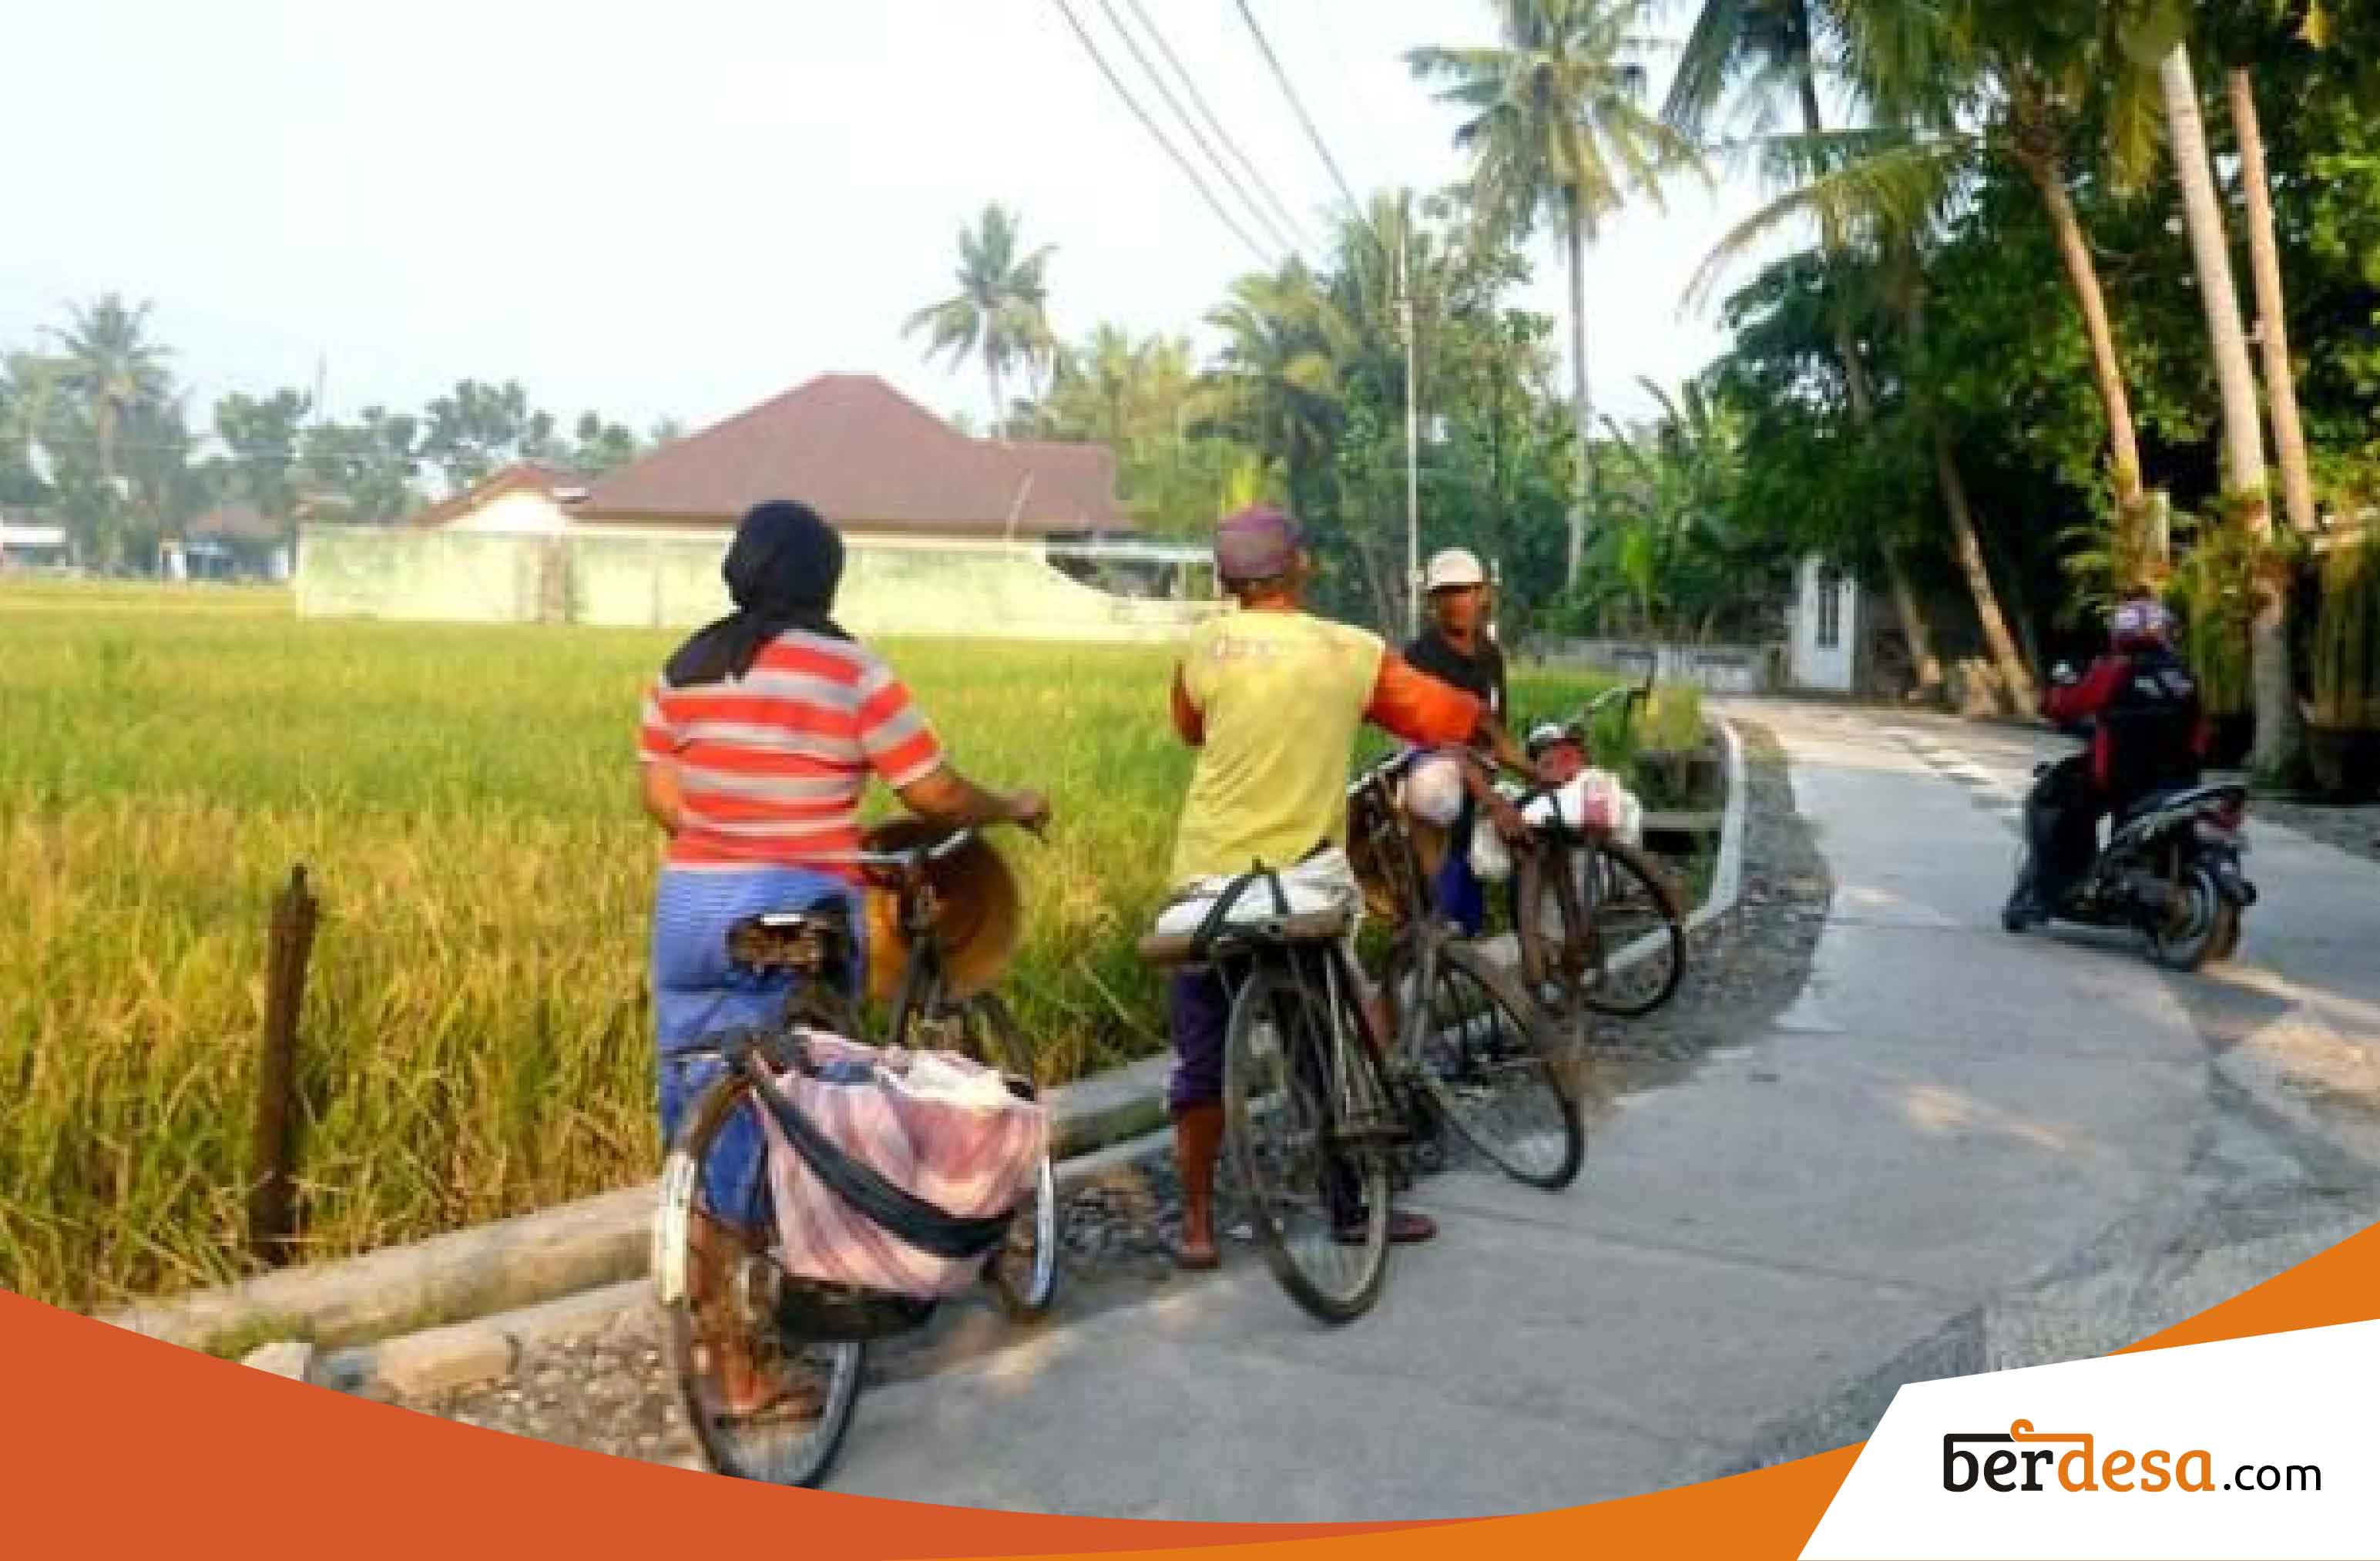 Peluang Usaha Pertanian Di Desa Berkembang Yang Sangat Menguntungkan – Berdesa